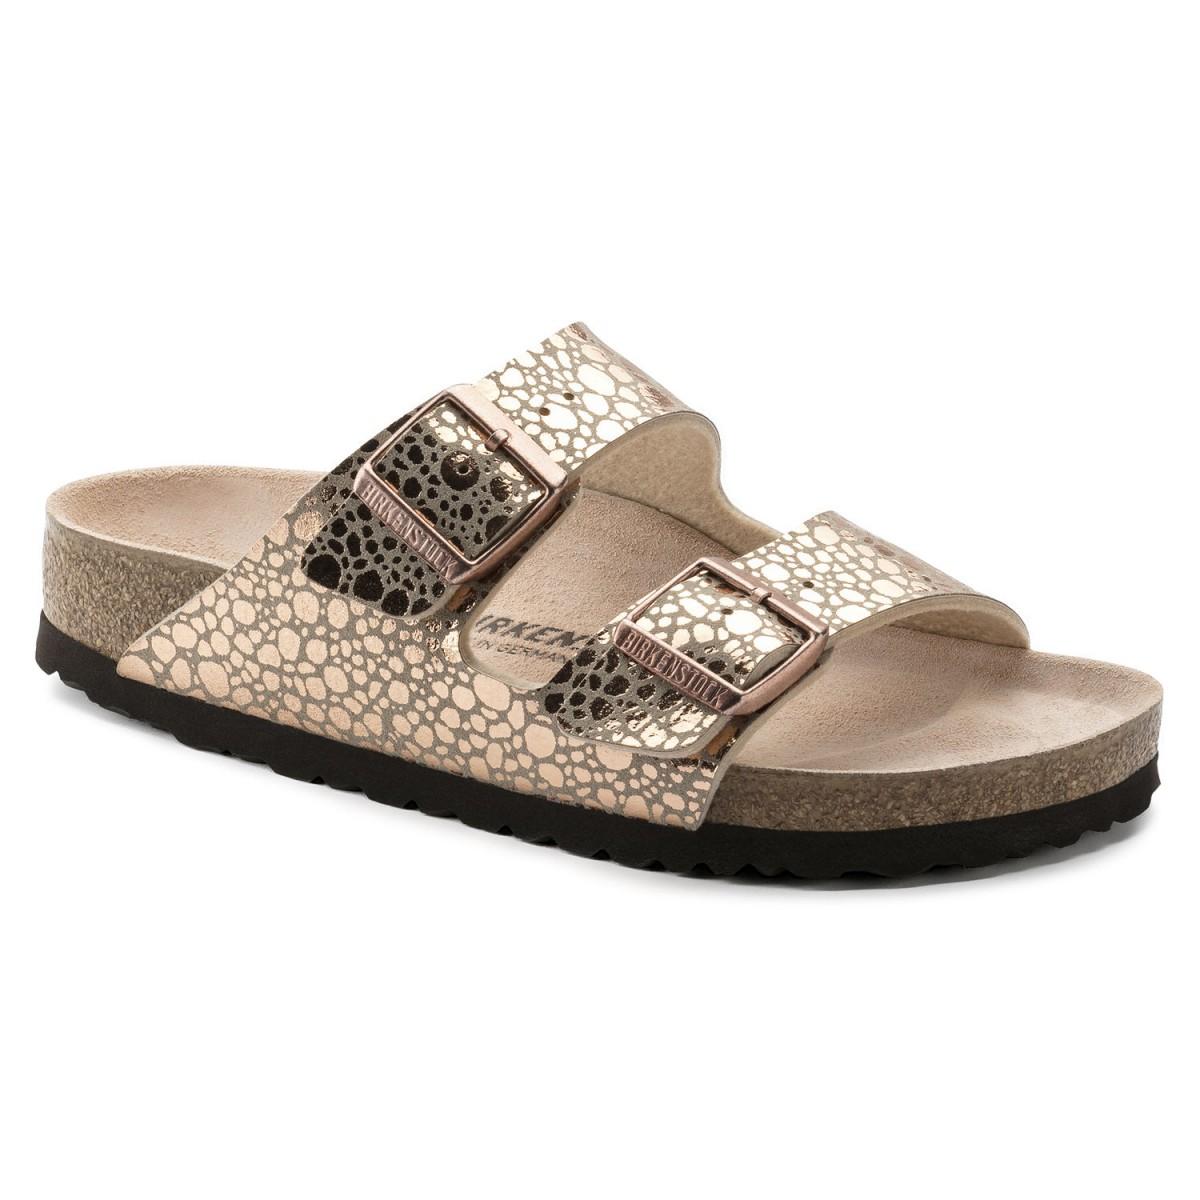 Details zu Birkenstock Arizona Damen Pantolette Sandale Sandalette Birkoflor Hausschuhe